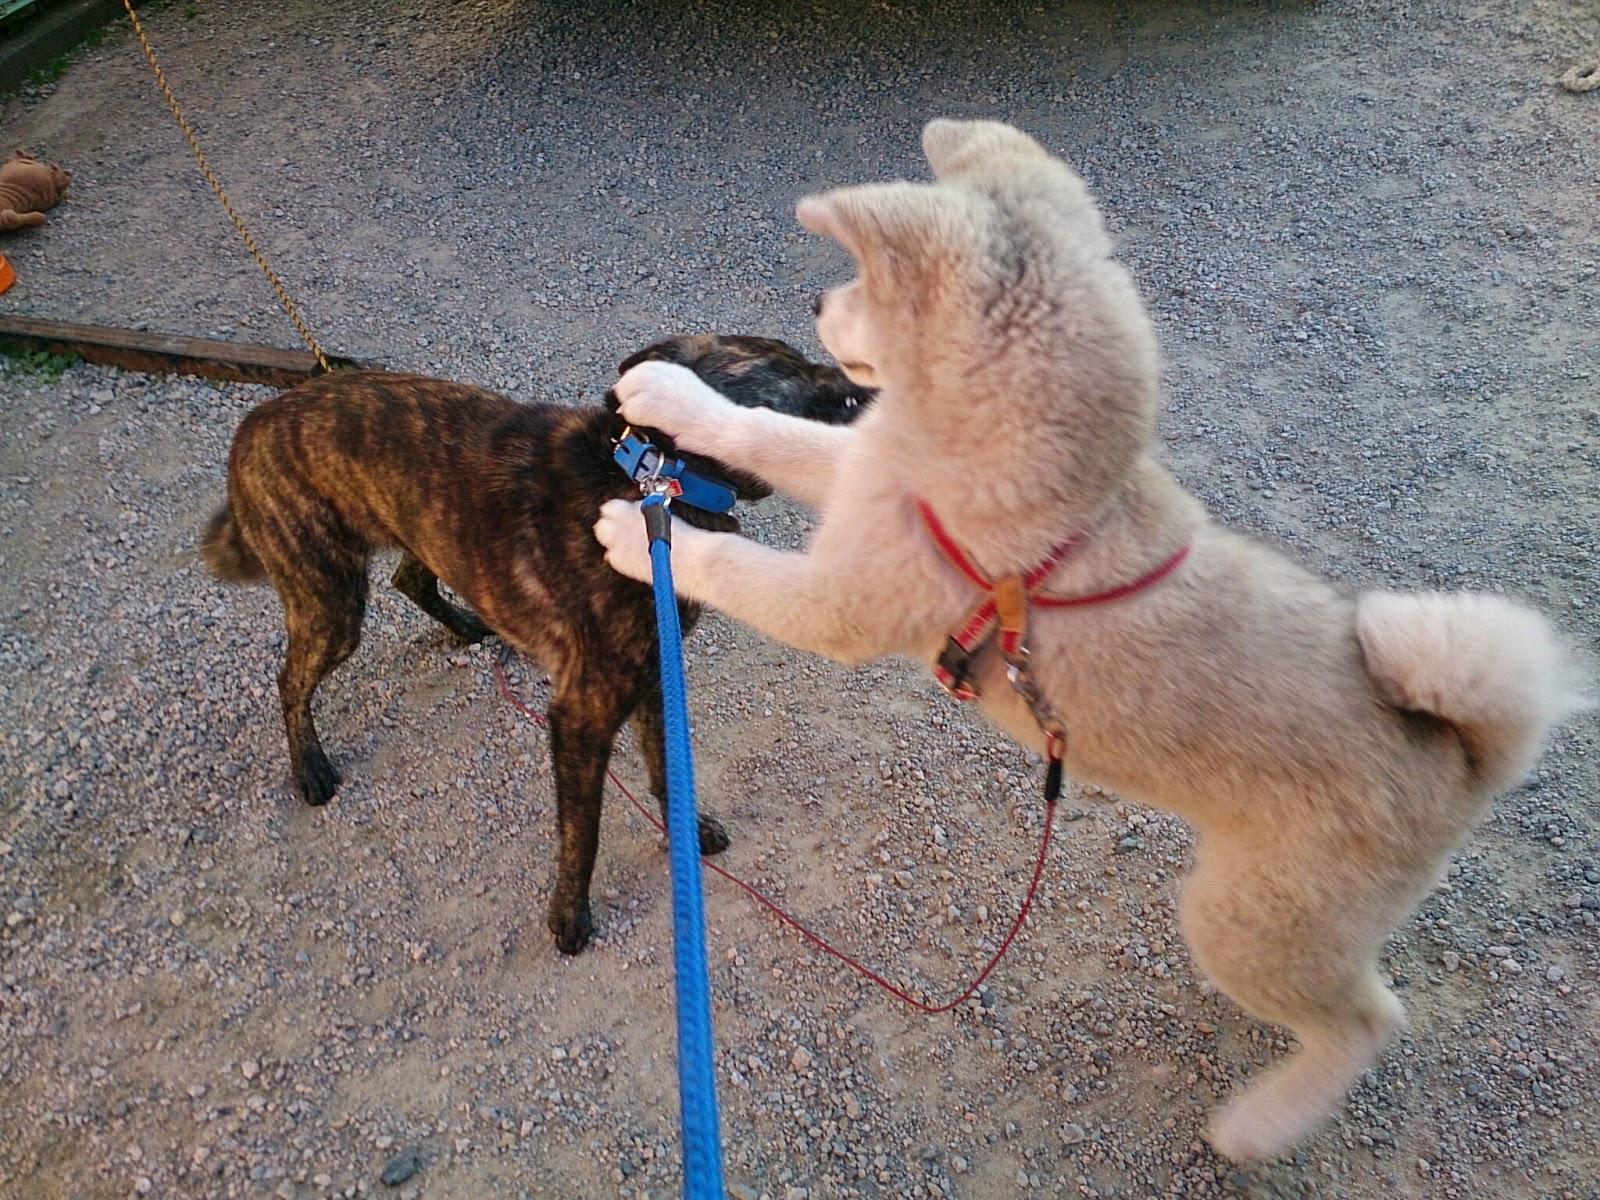 甲斐犬 meets 秋田犬